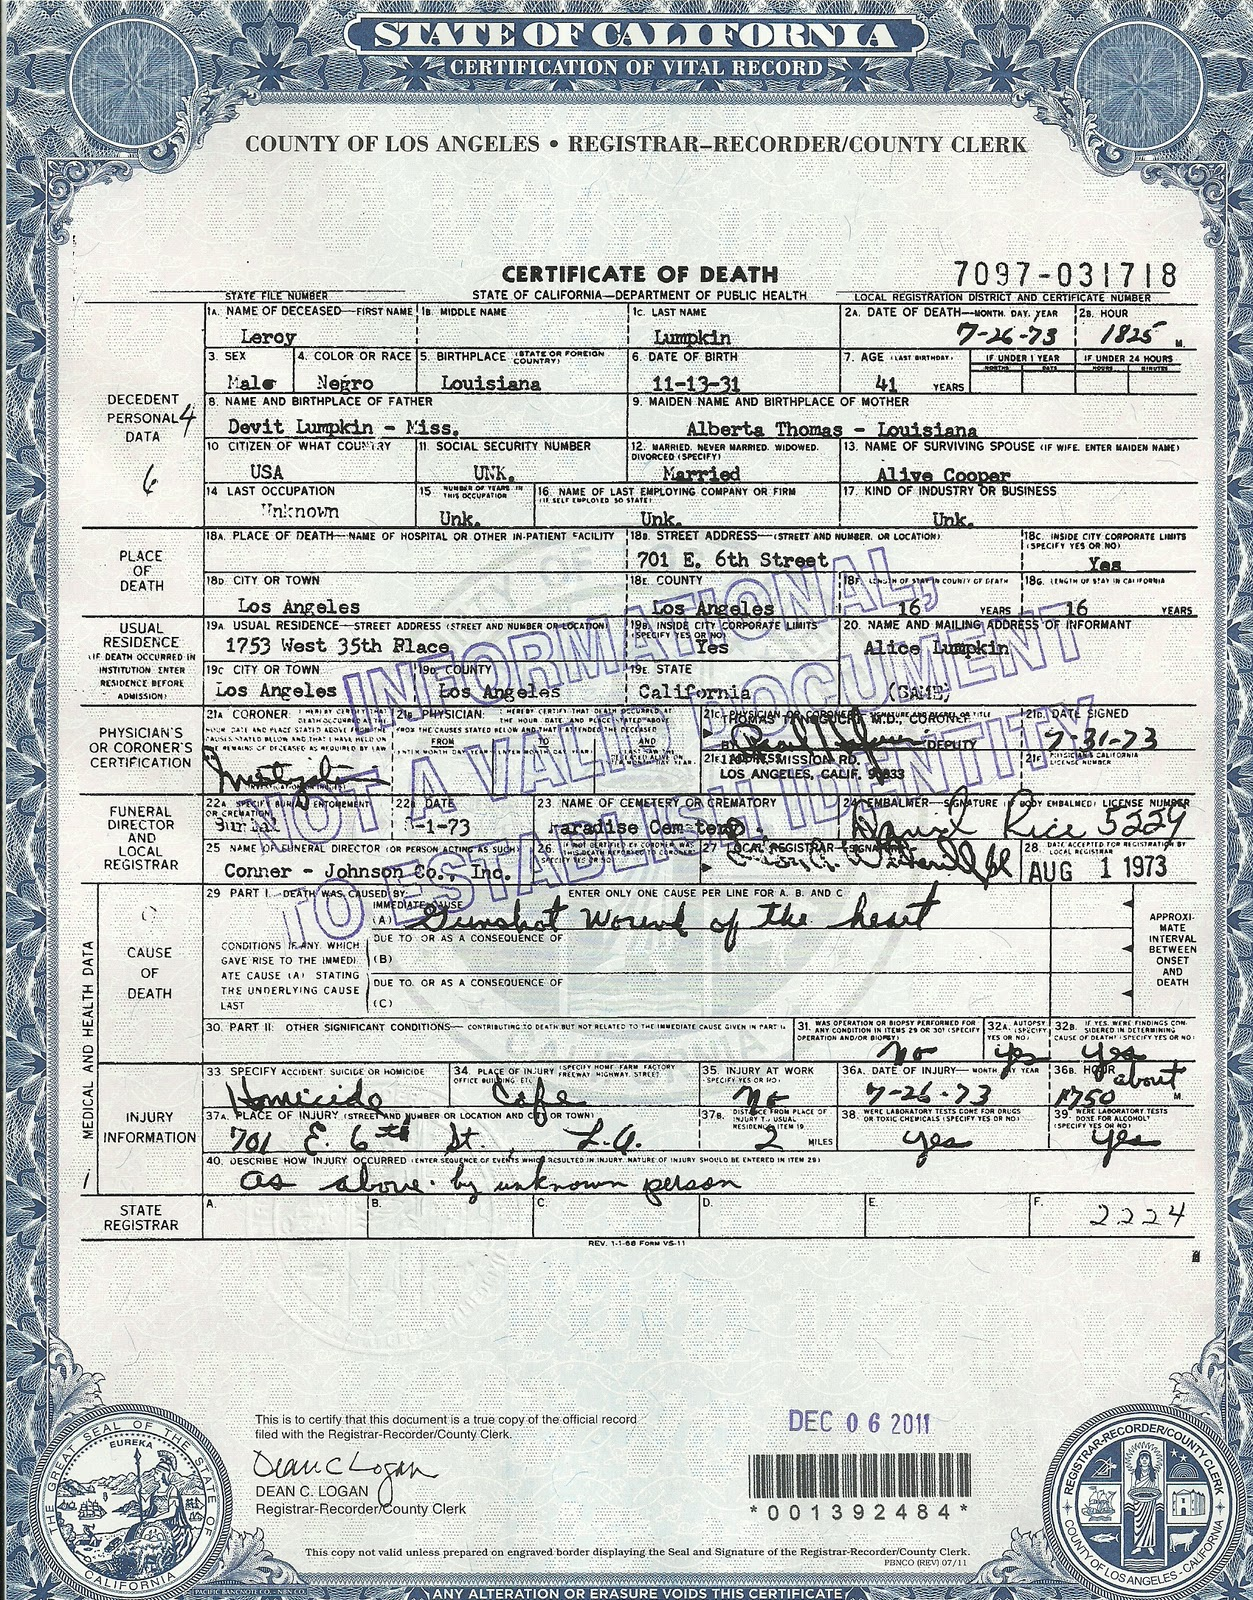 Fes sankofa quest leroy lumpkin death certificate xflitez Gallery